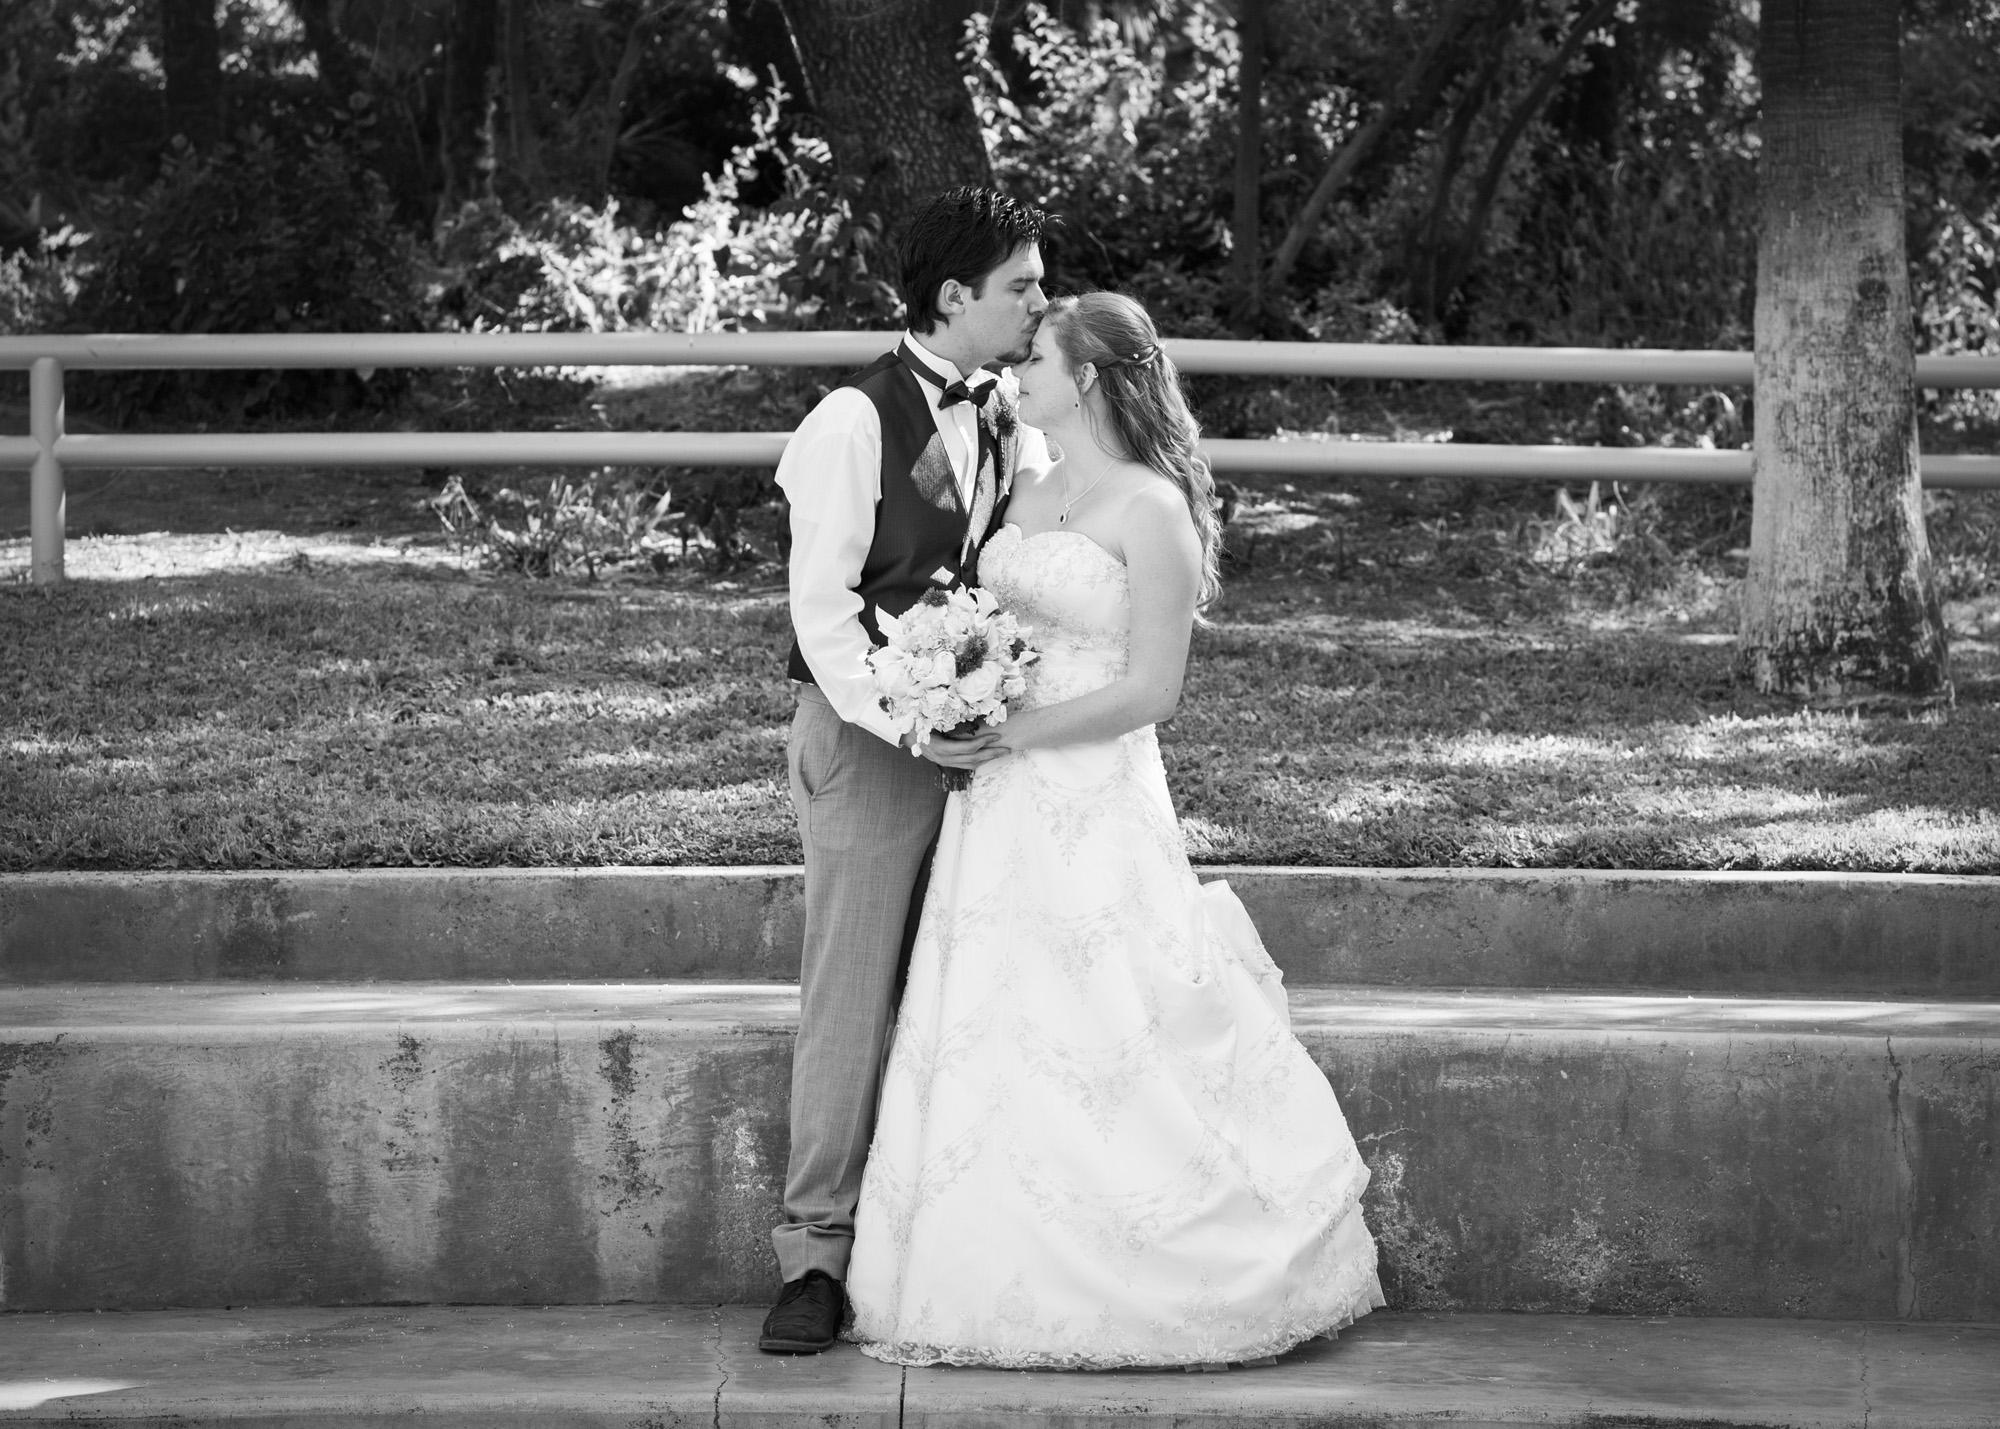 black and white newlyweds